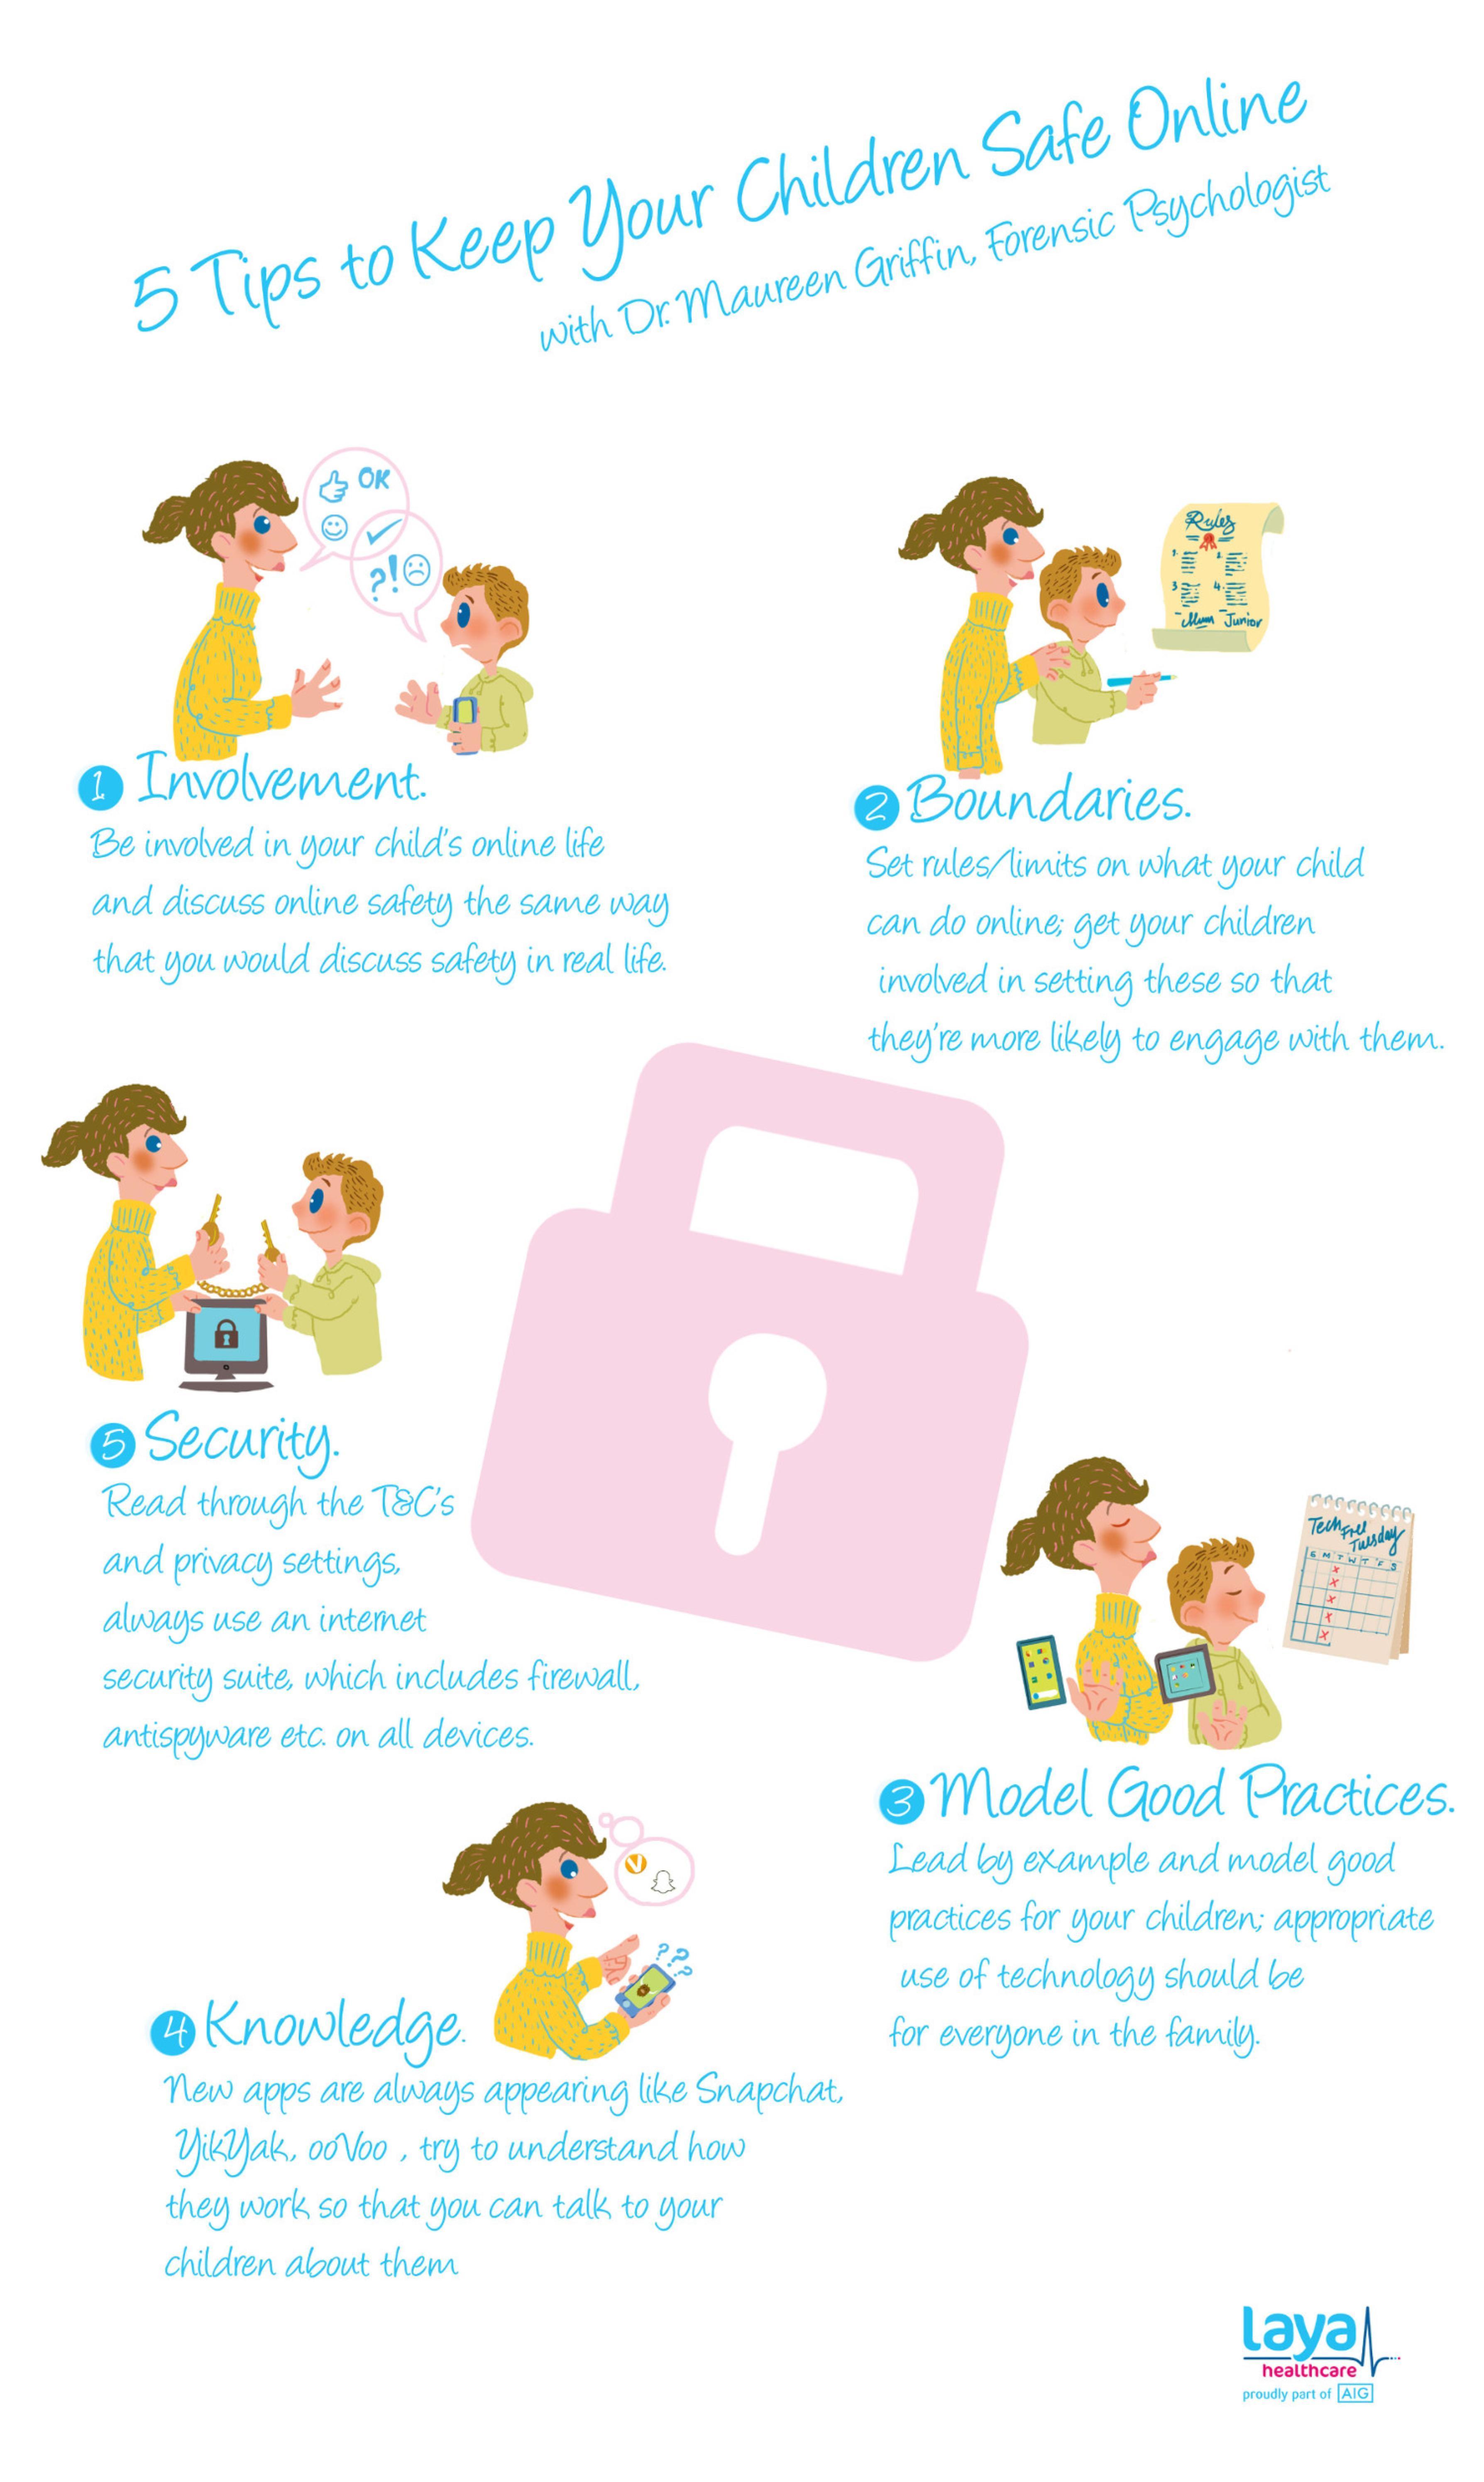 5 tips for keeping kids safe online | Family Advice Hub ...